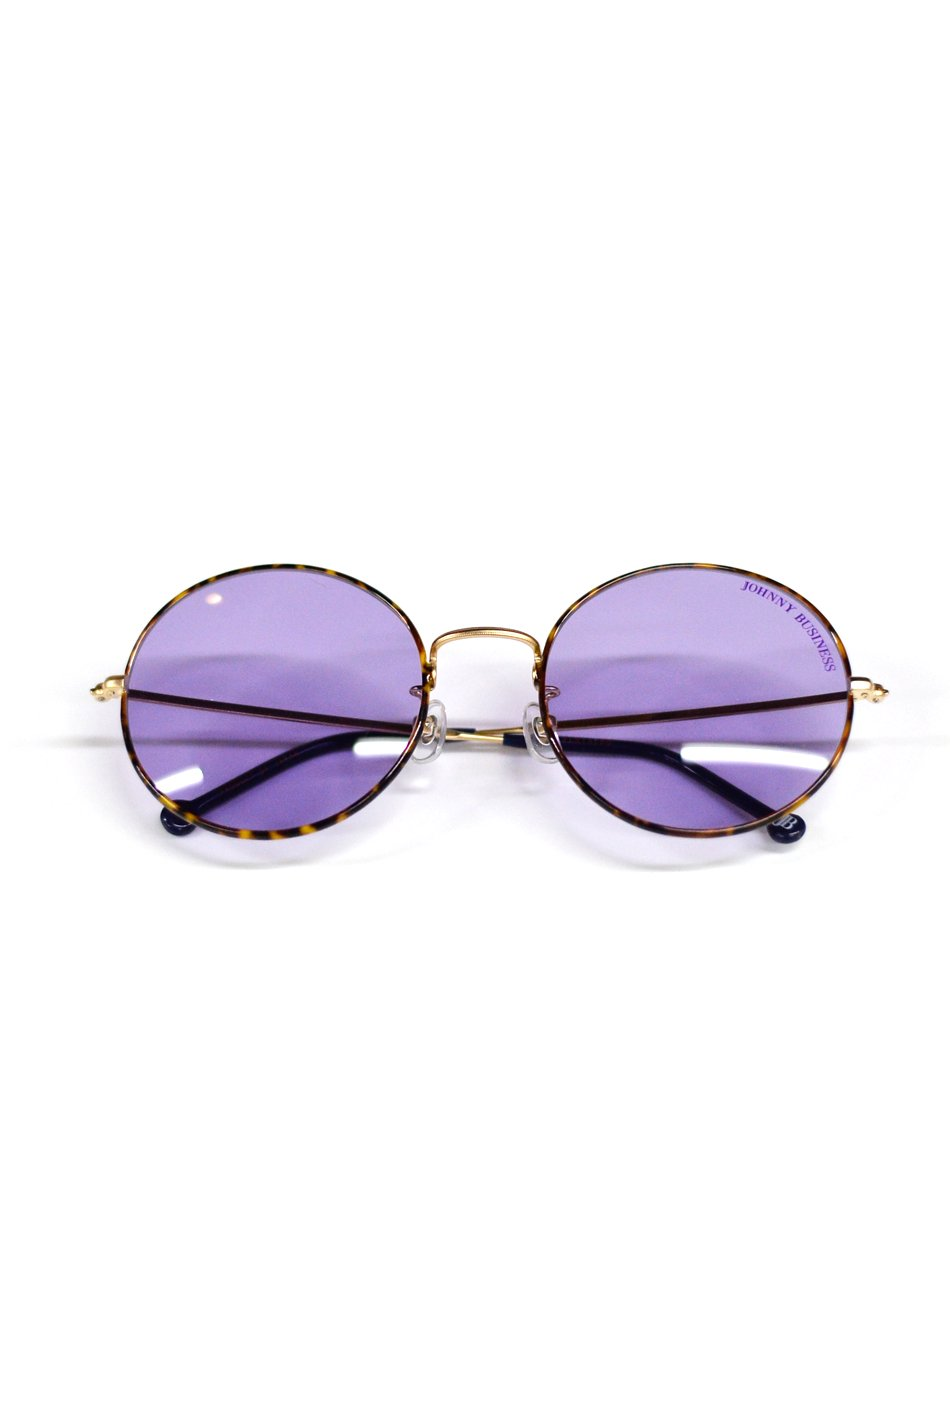 Johnny Business × VERYNERD Effie Rd. Type JB / Purple